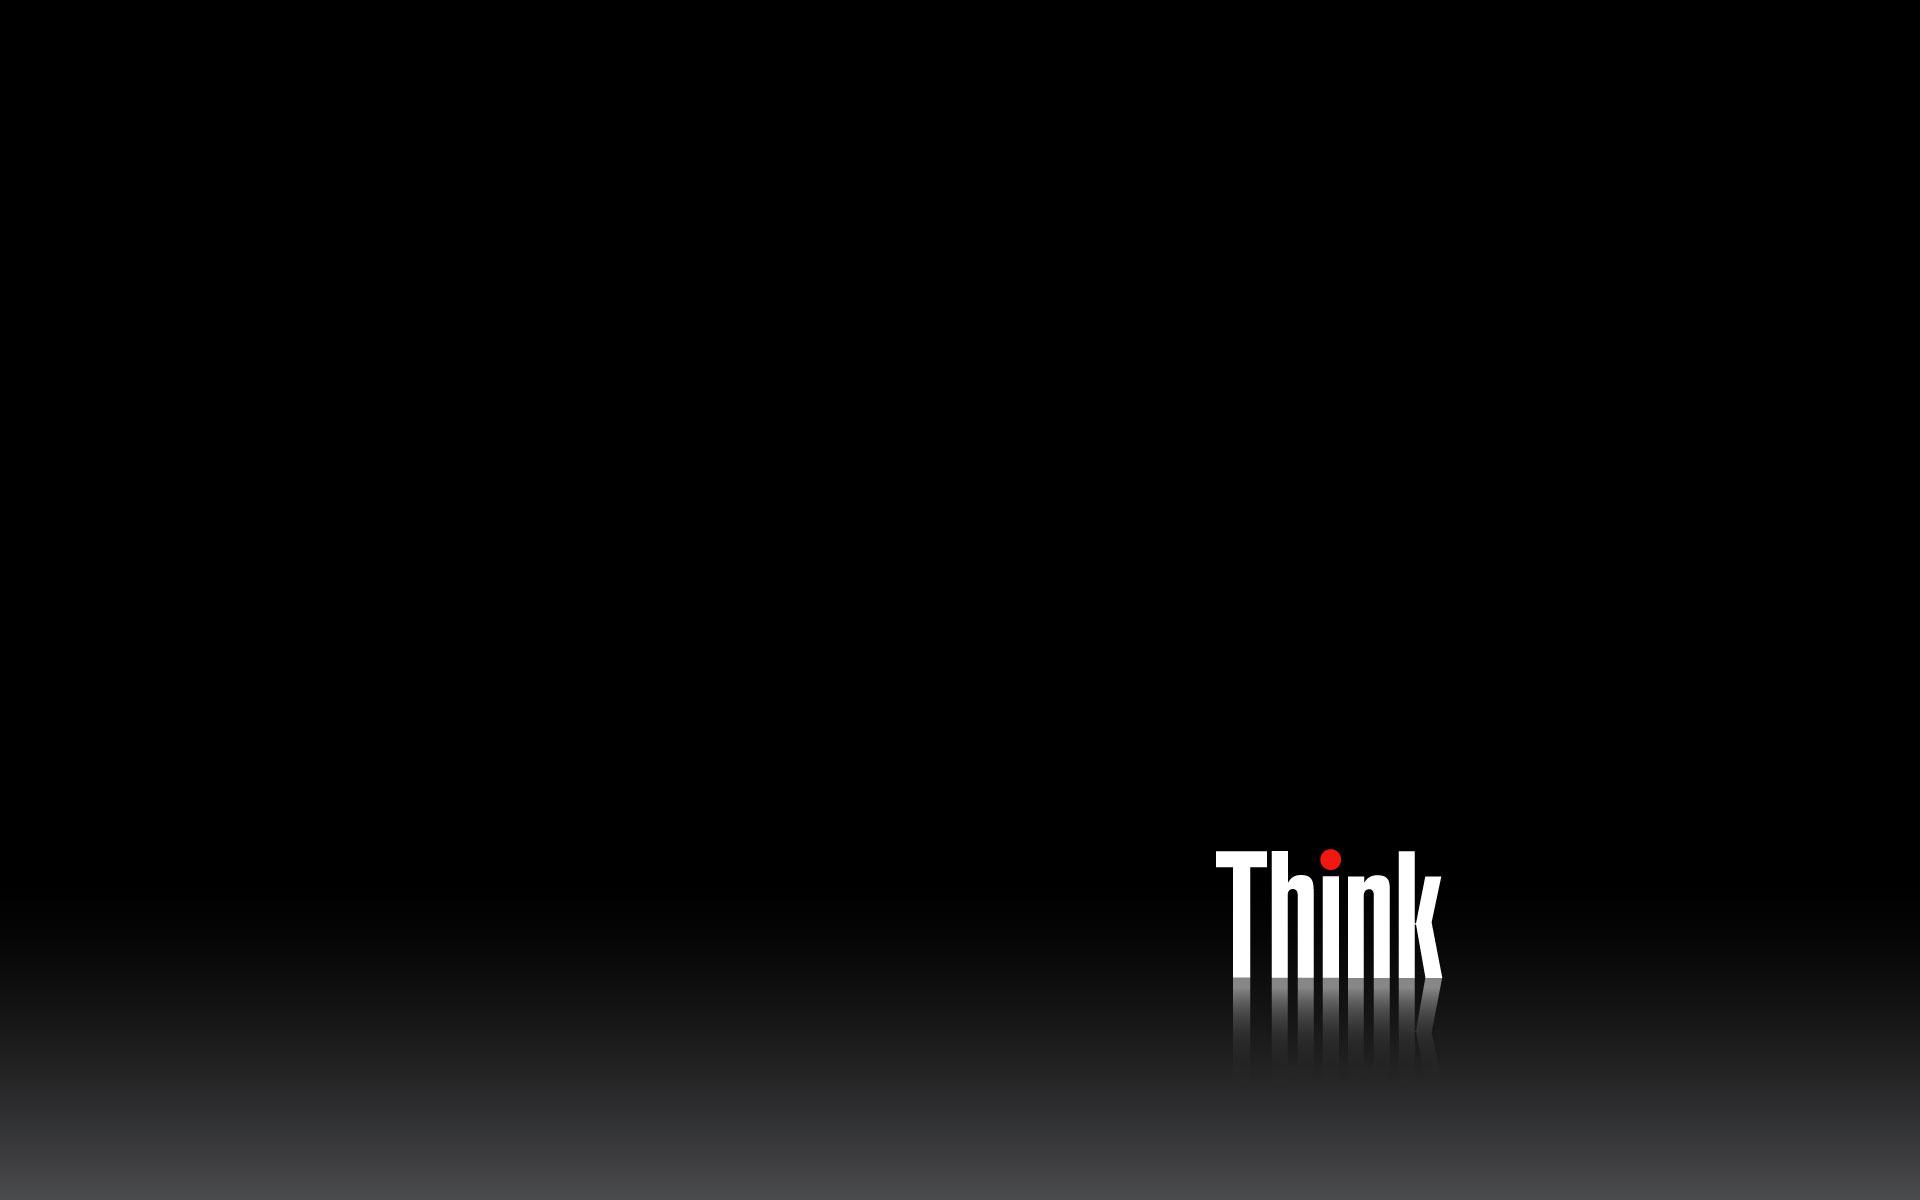 46 Thinkpad Desktop Wallpaper On Wallpapersafari